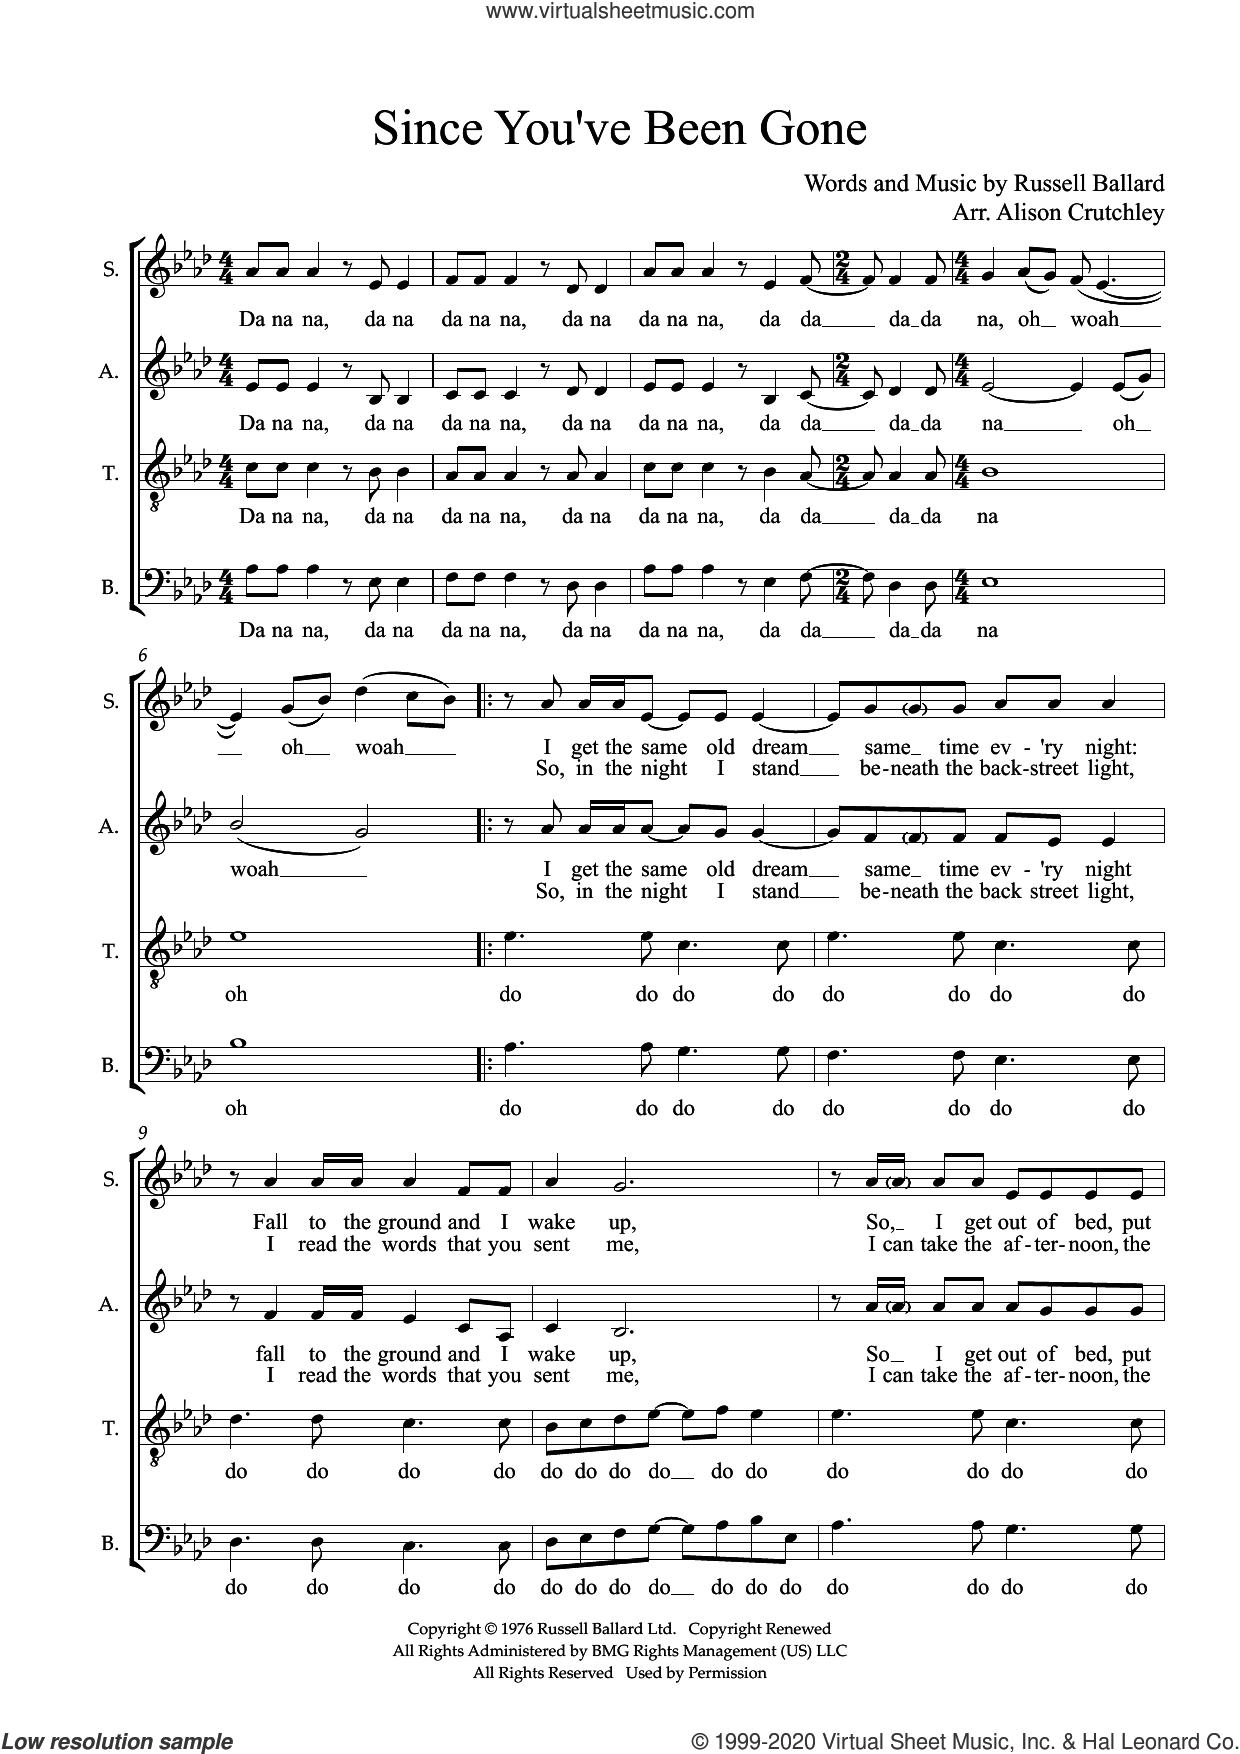 Since You've Been Gone (arr. Alison Crutchley) sheet music for choir (SATB: soprano, alto, tenor, bass) by Rainbow, Alison Crutchley and Russ Ballard, intermediate skill level